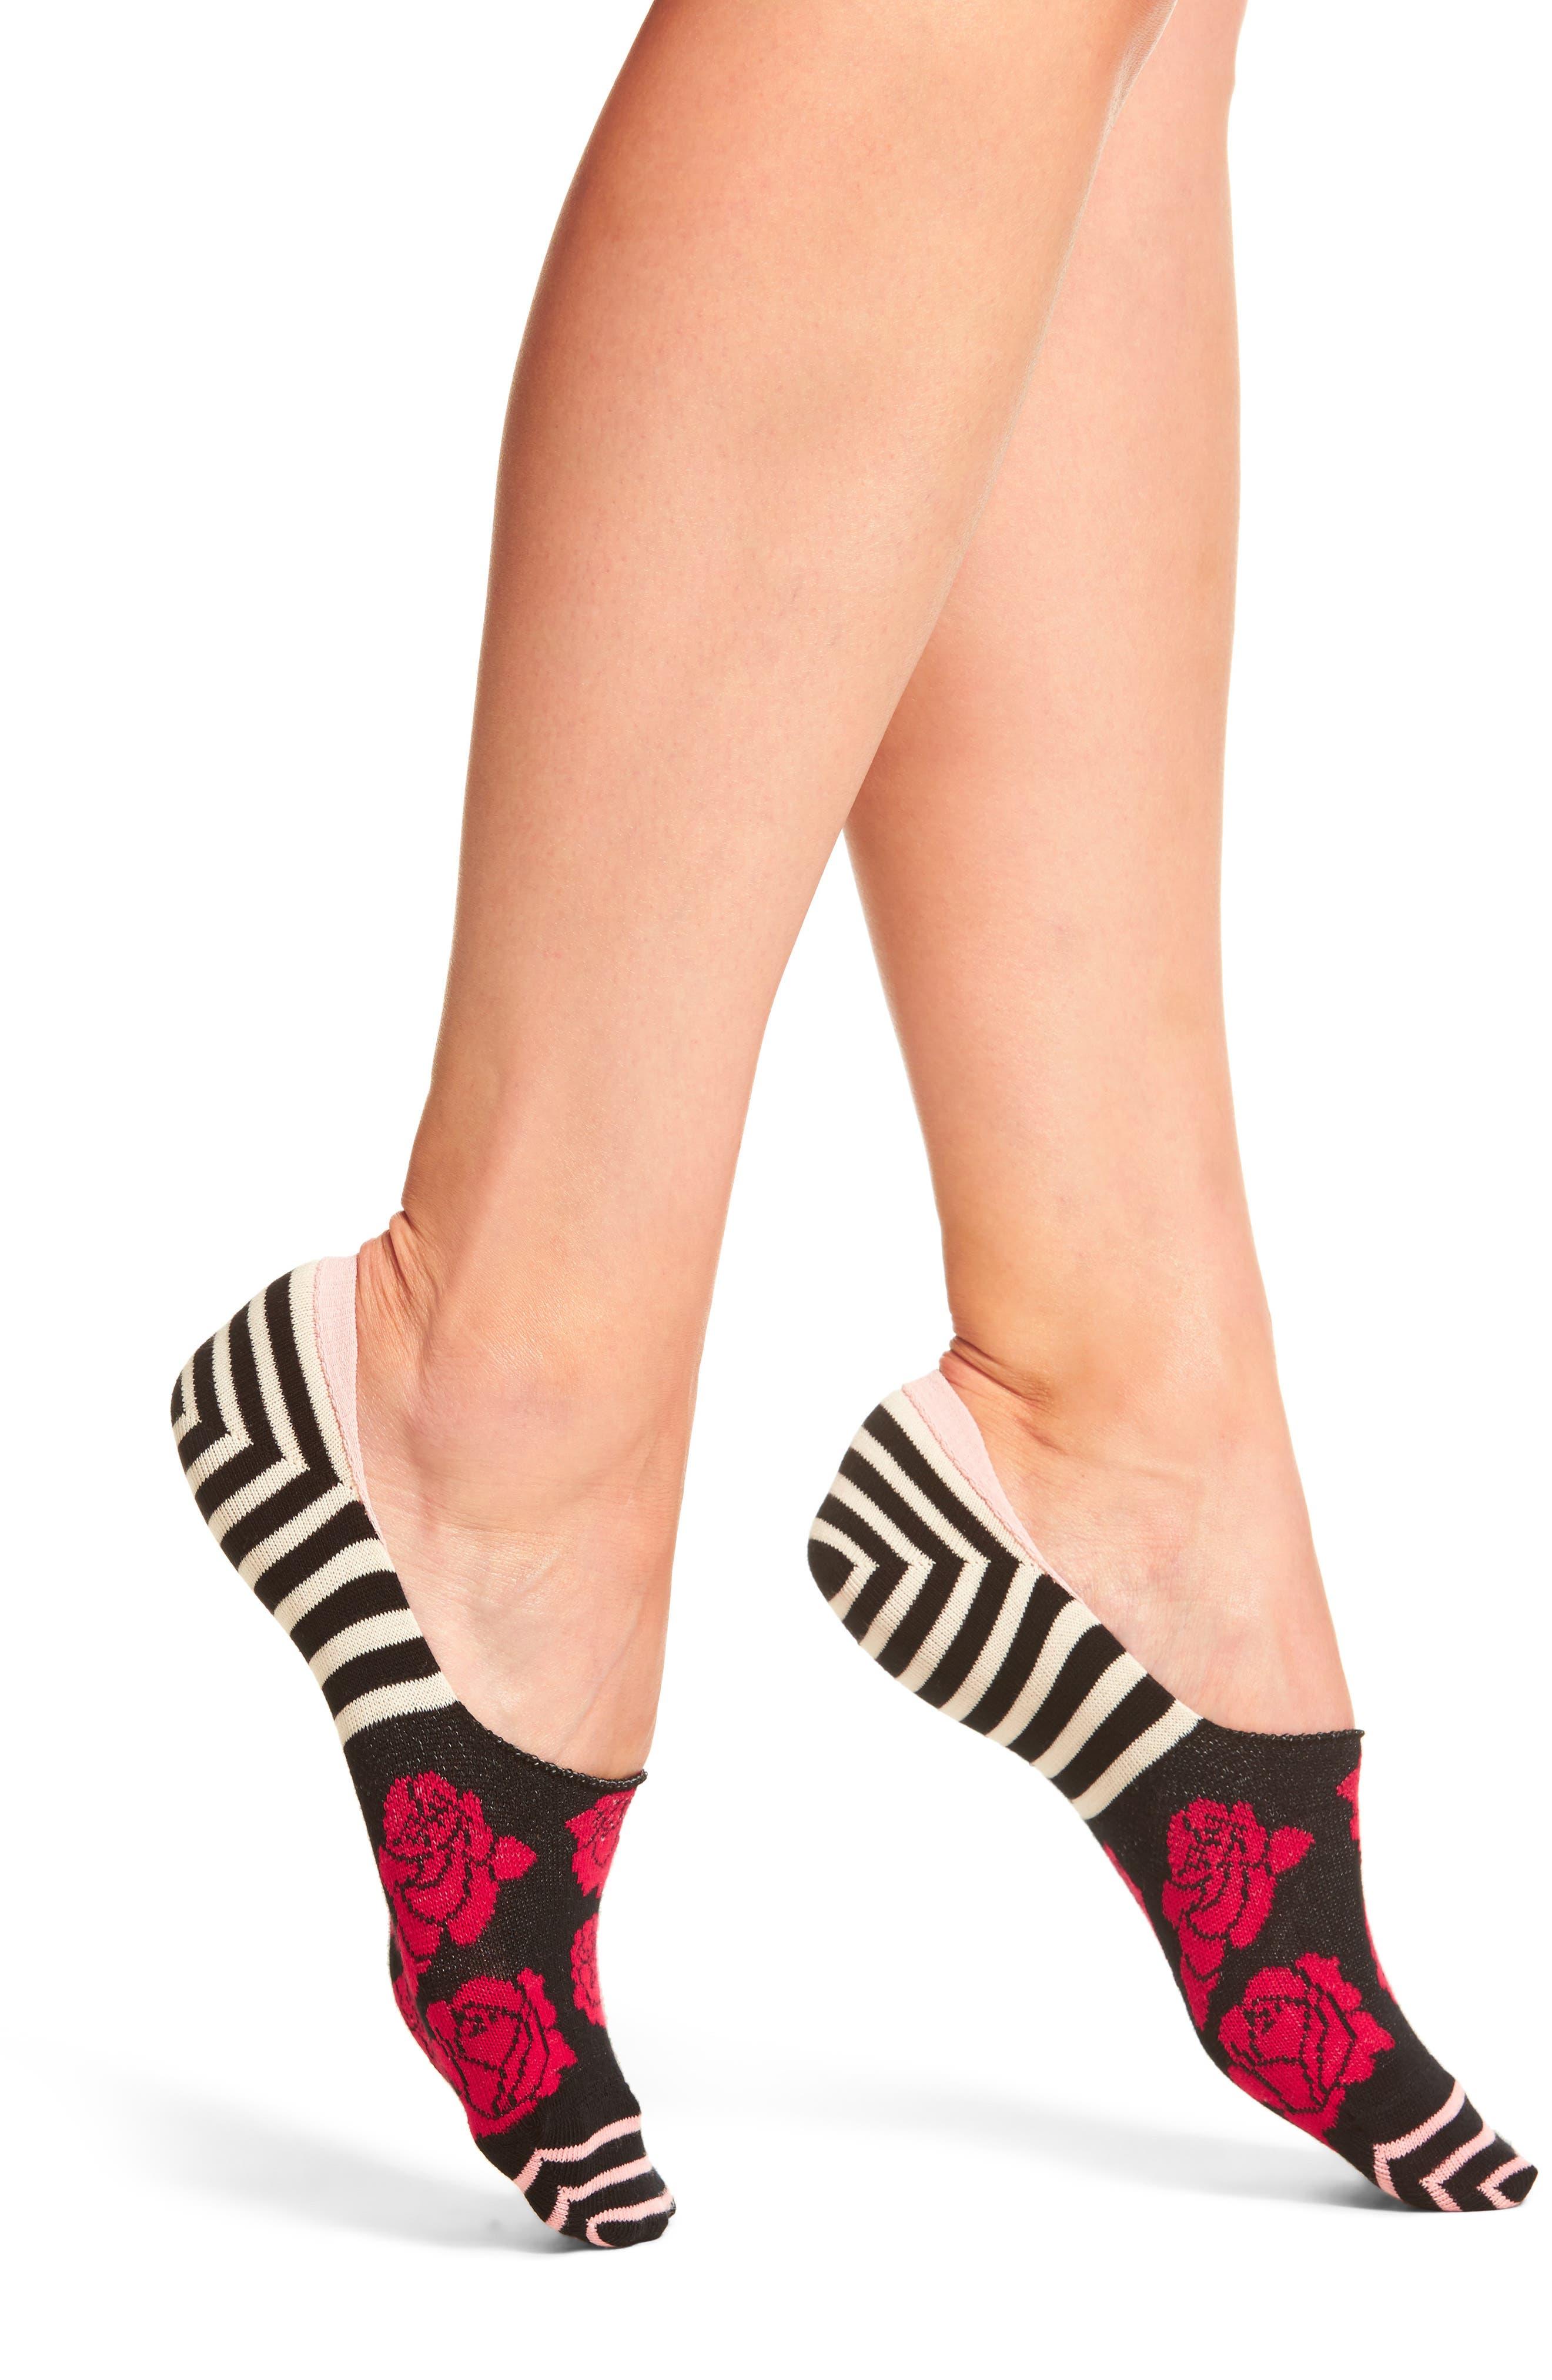 Rose Liner Socks,                             Main thumbnail 1, color,                             005